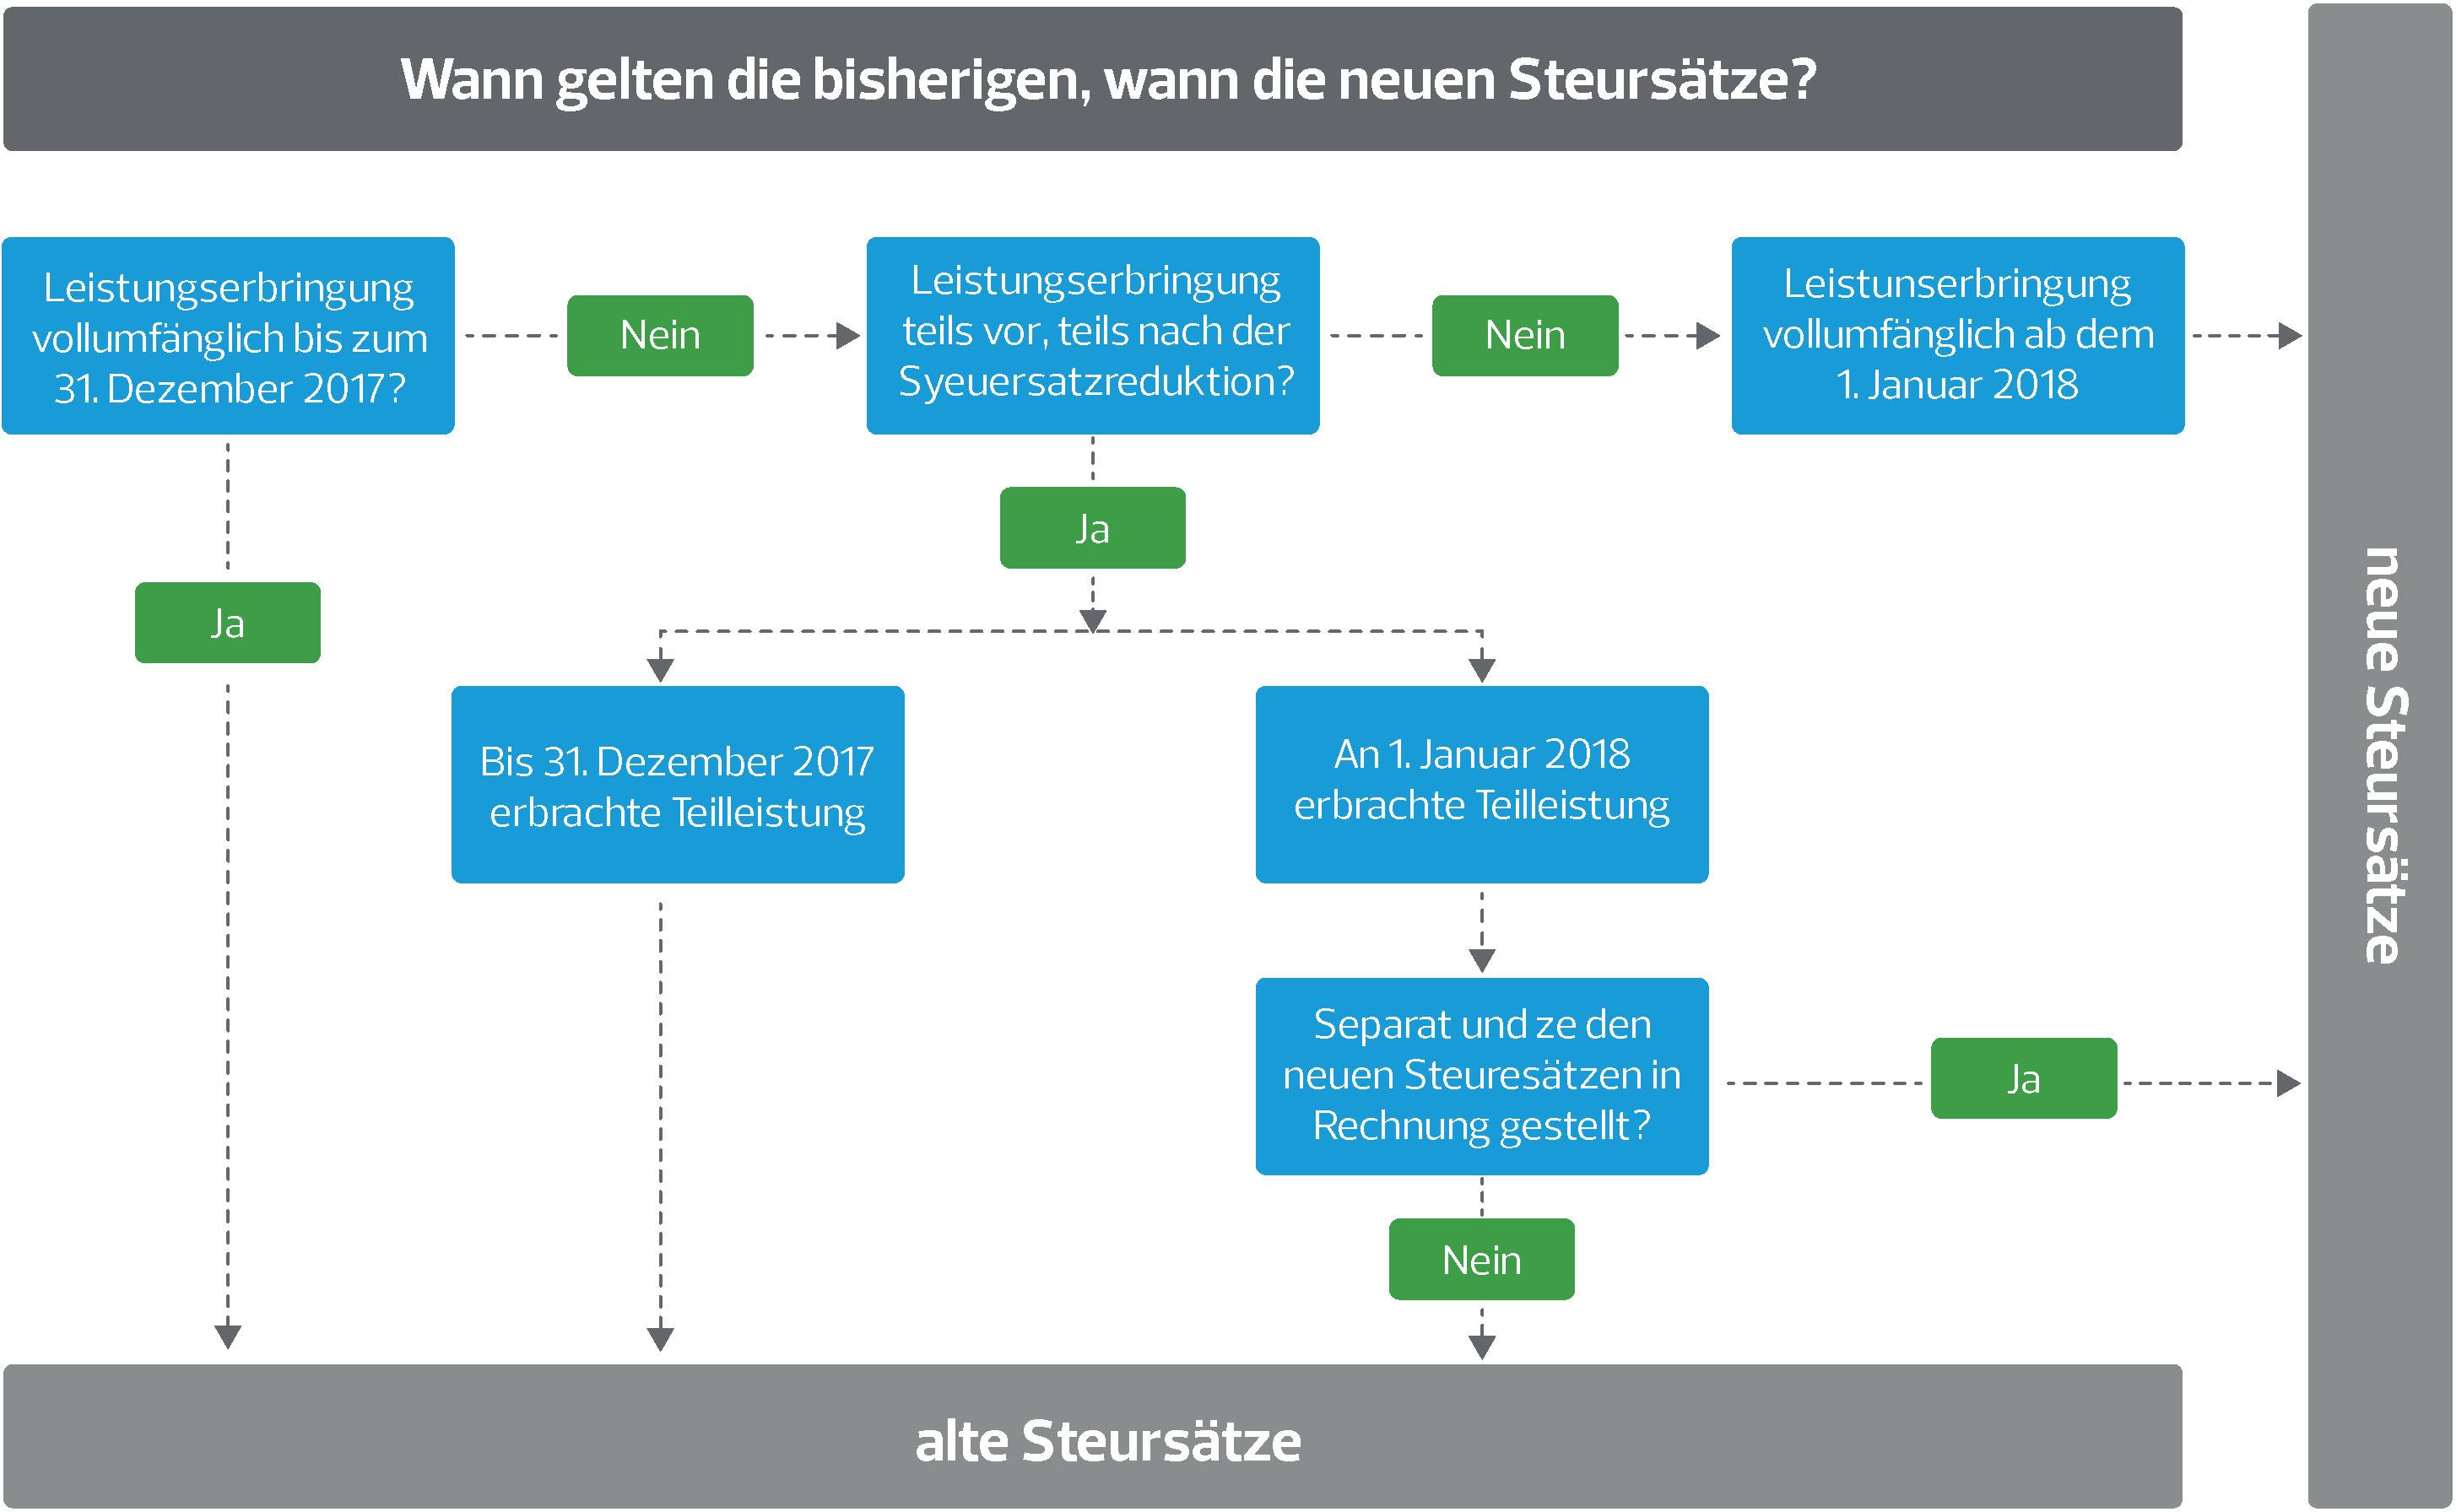 new_vat_rates_in_switzerland.jpg